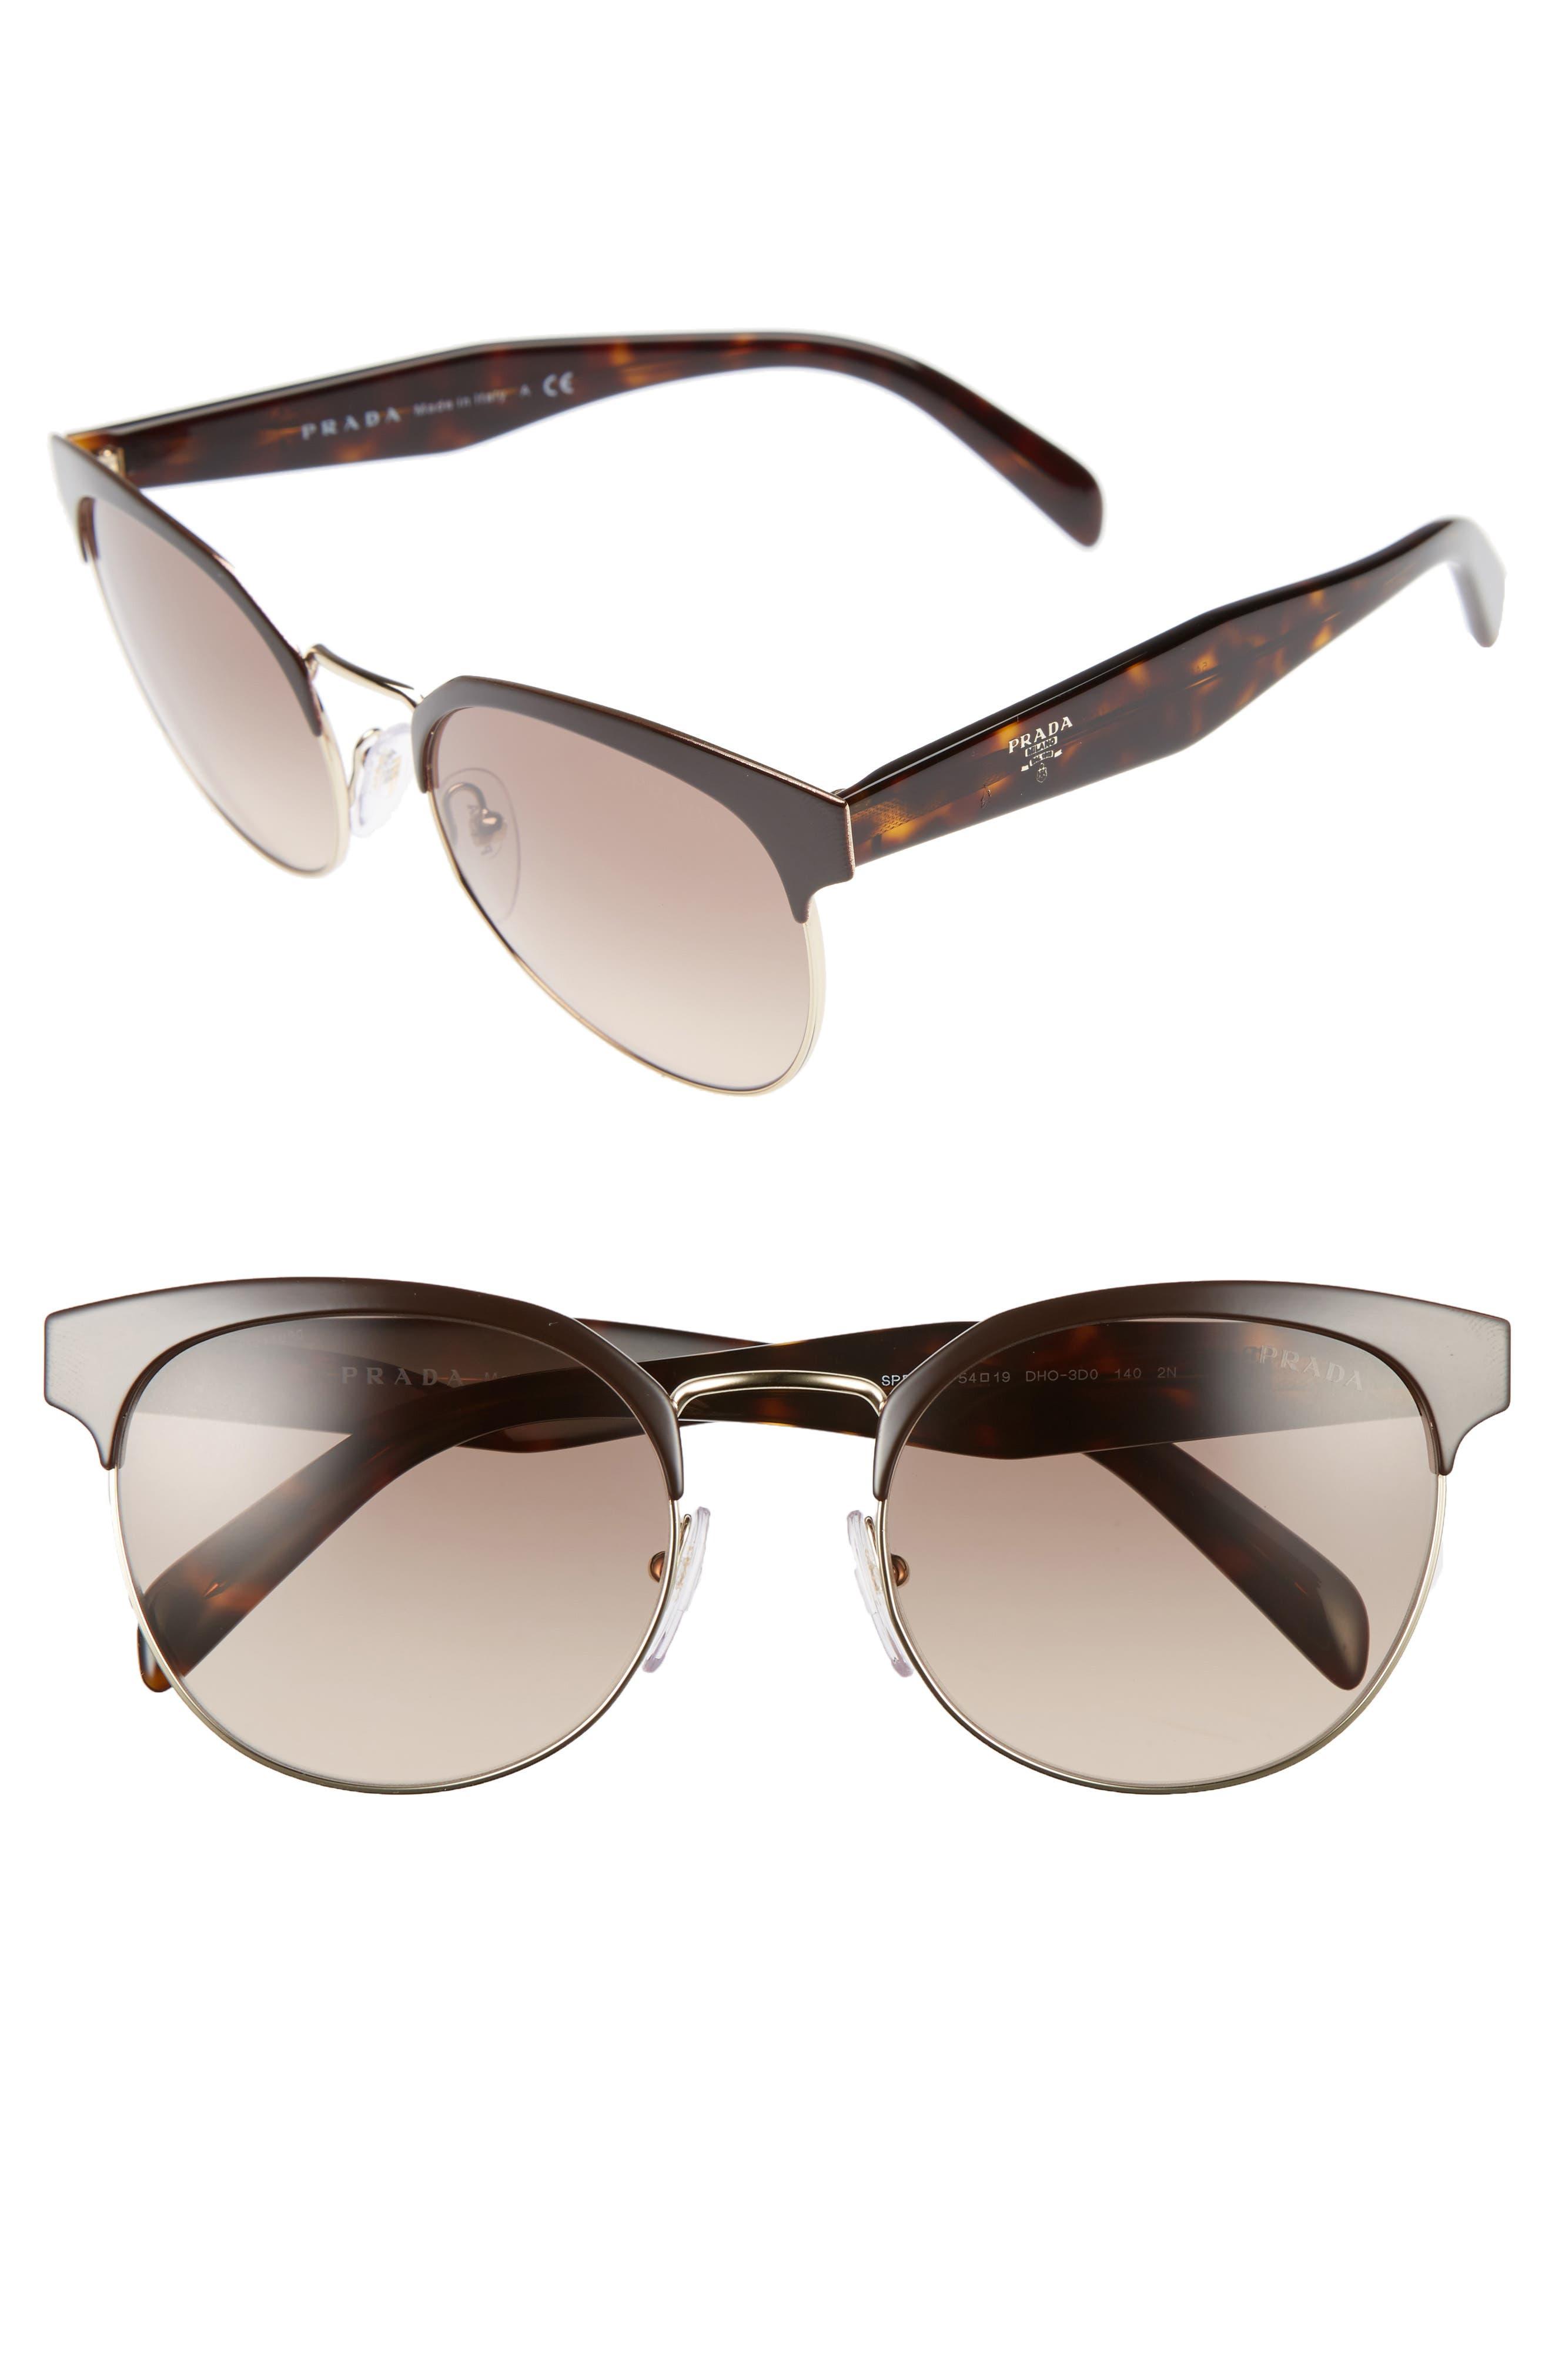 54mm Gradient Round Sunglasses,                             Main thumbnail 1, color,